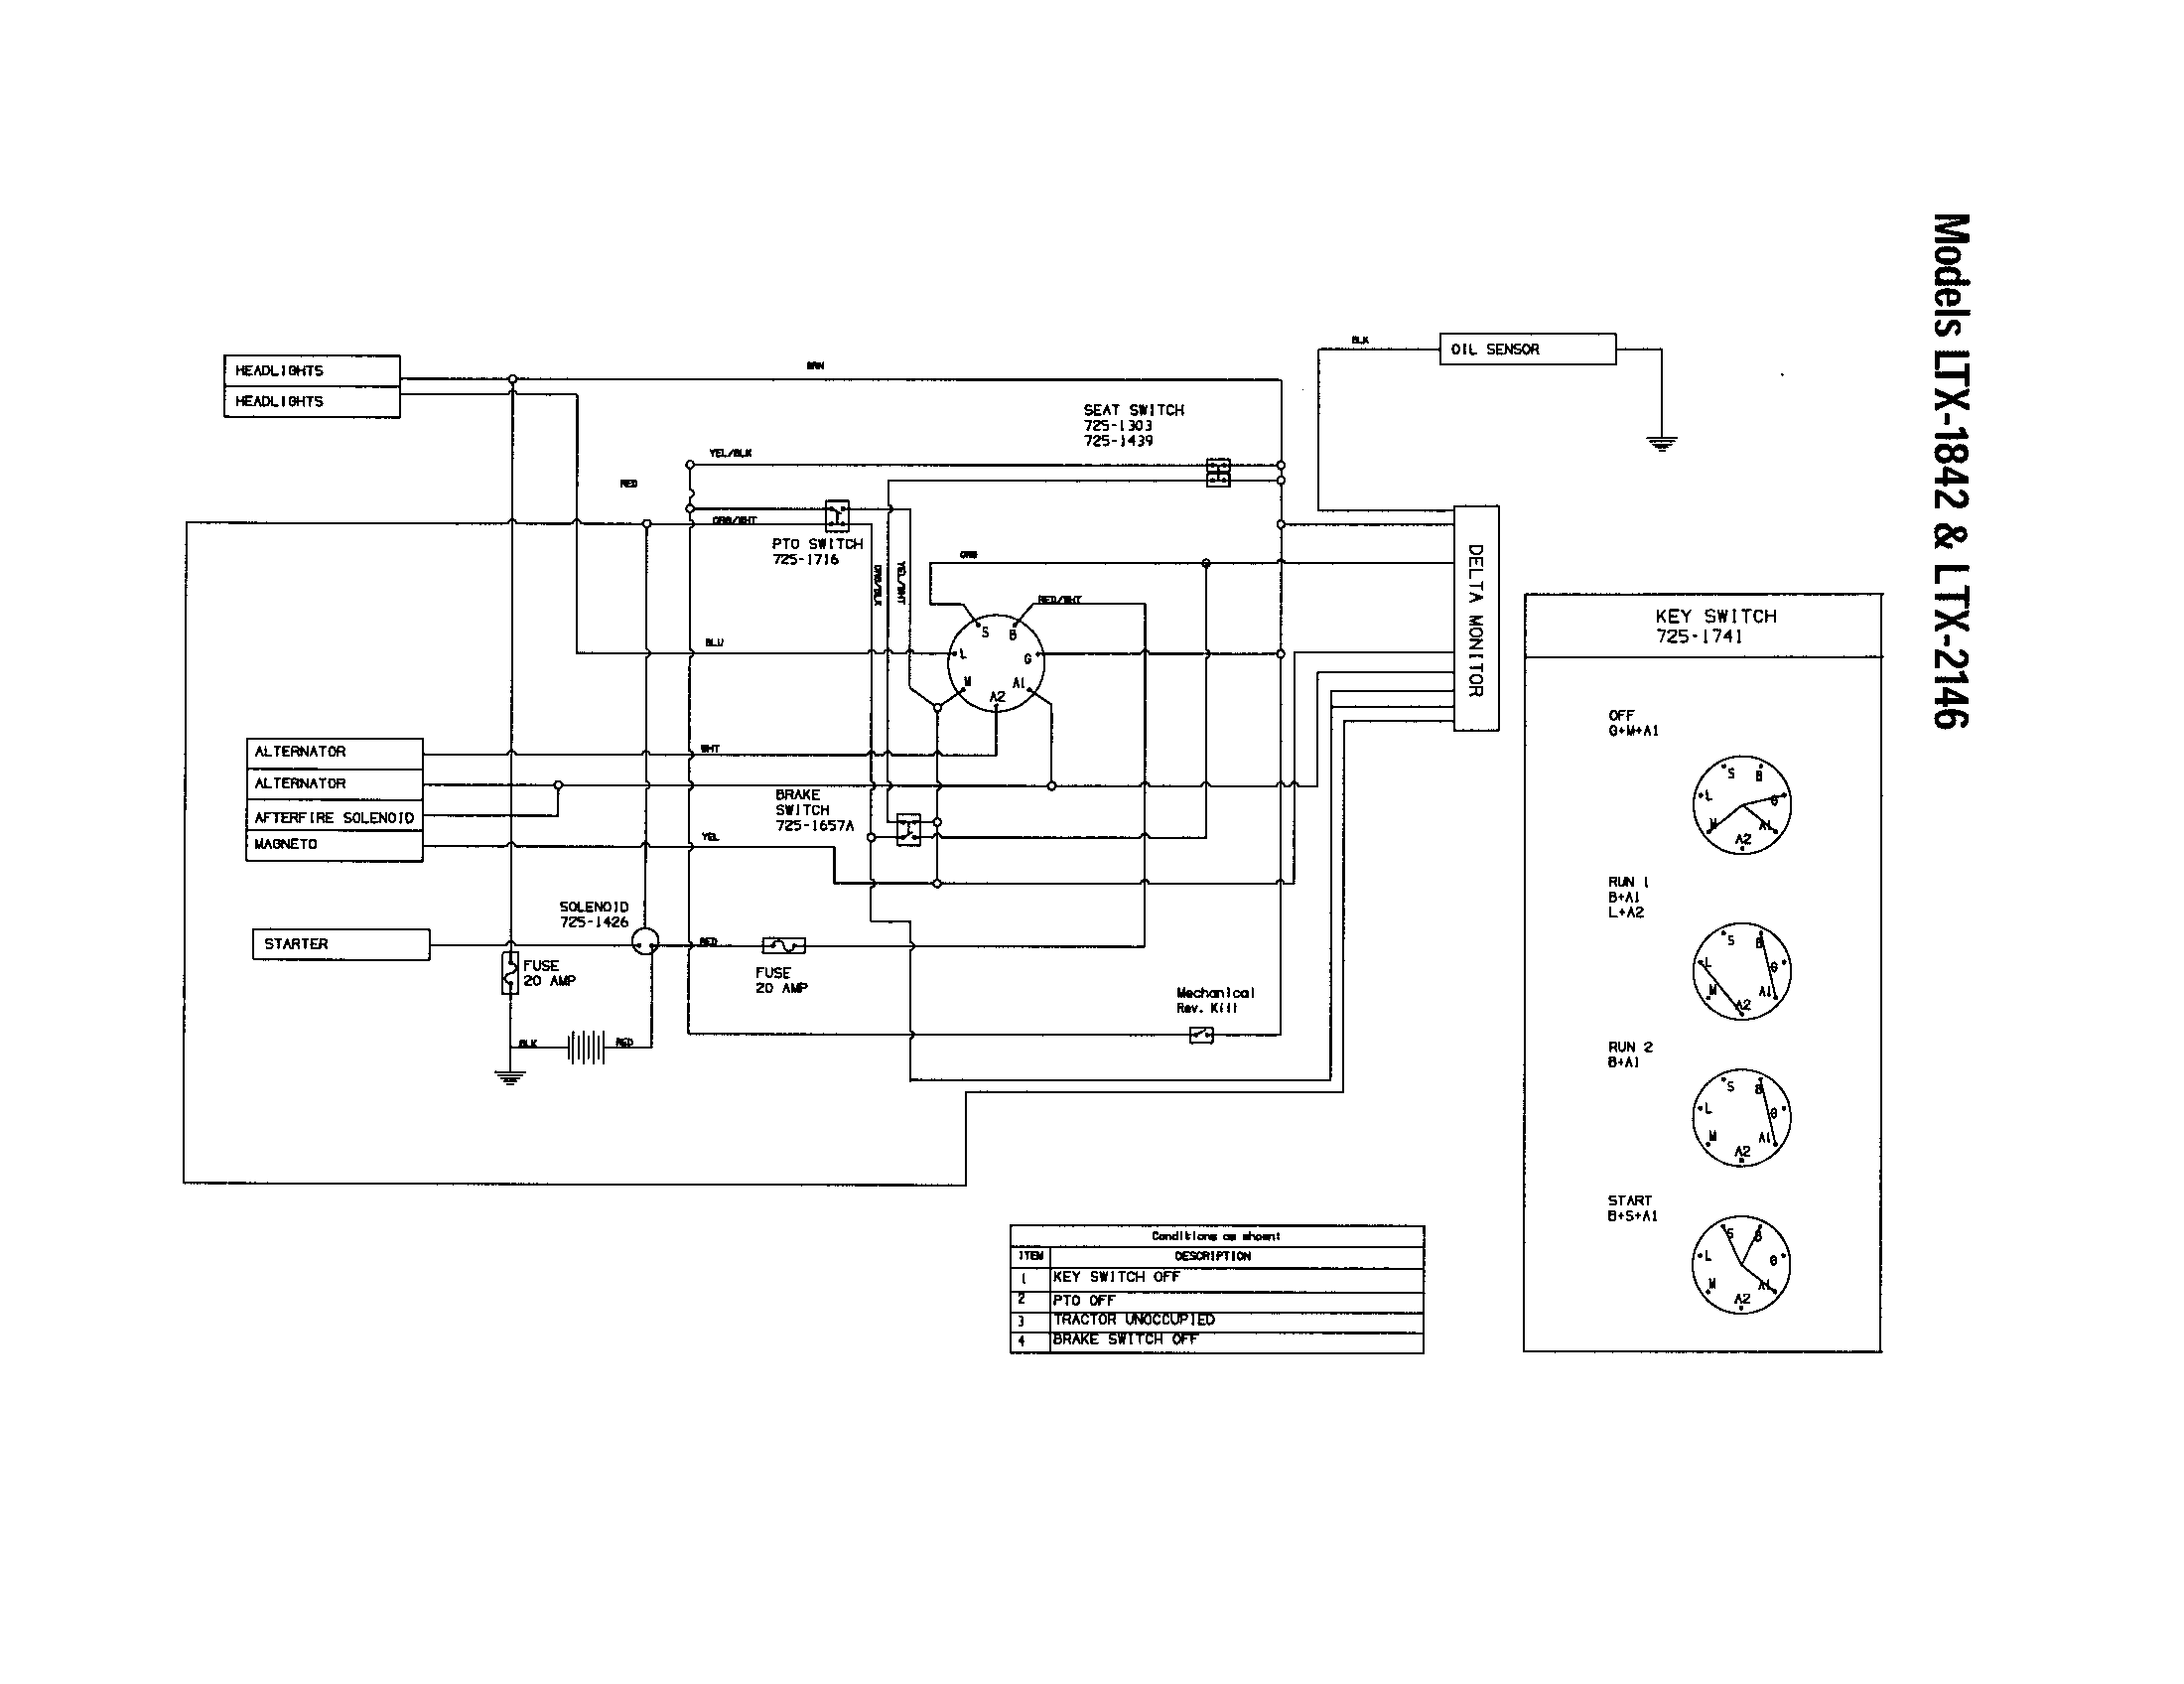 Wiring diagram diagram parts list for model 13ap609g063 troybilt wiring diagram